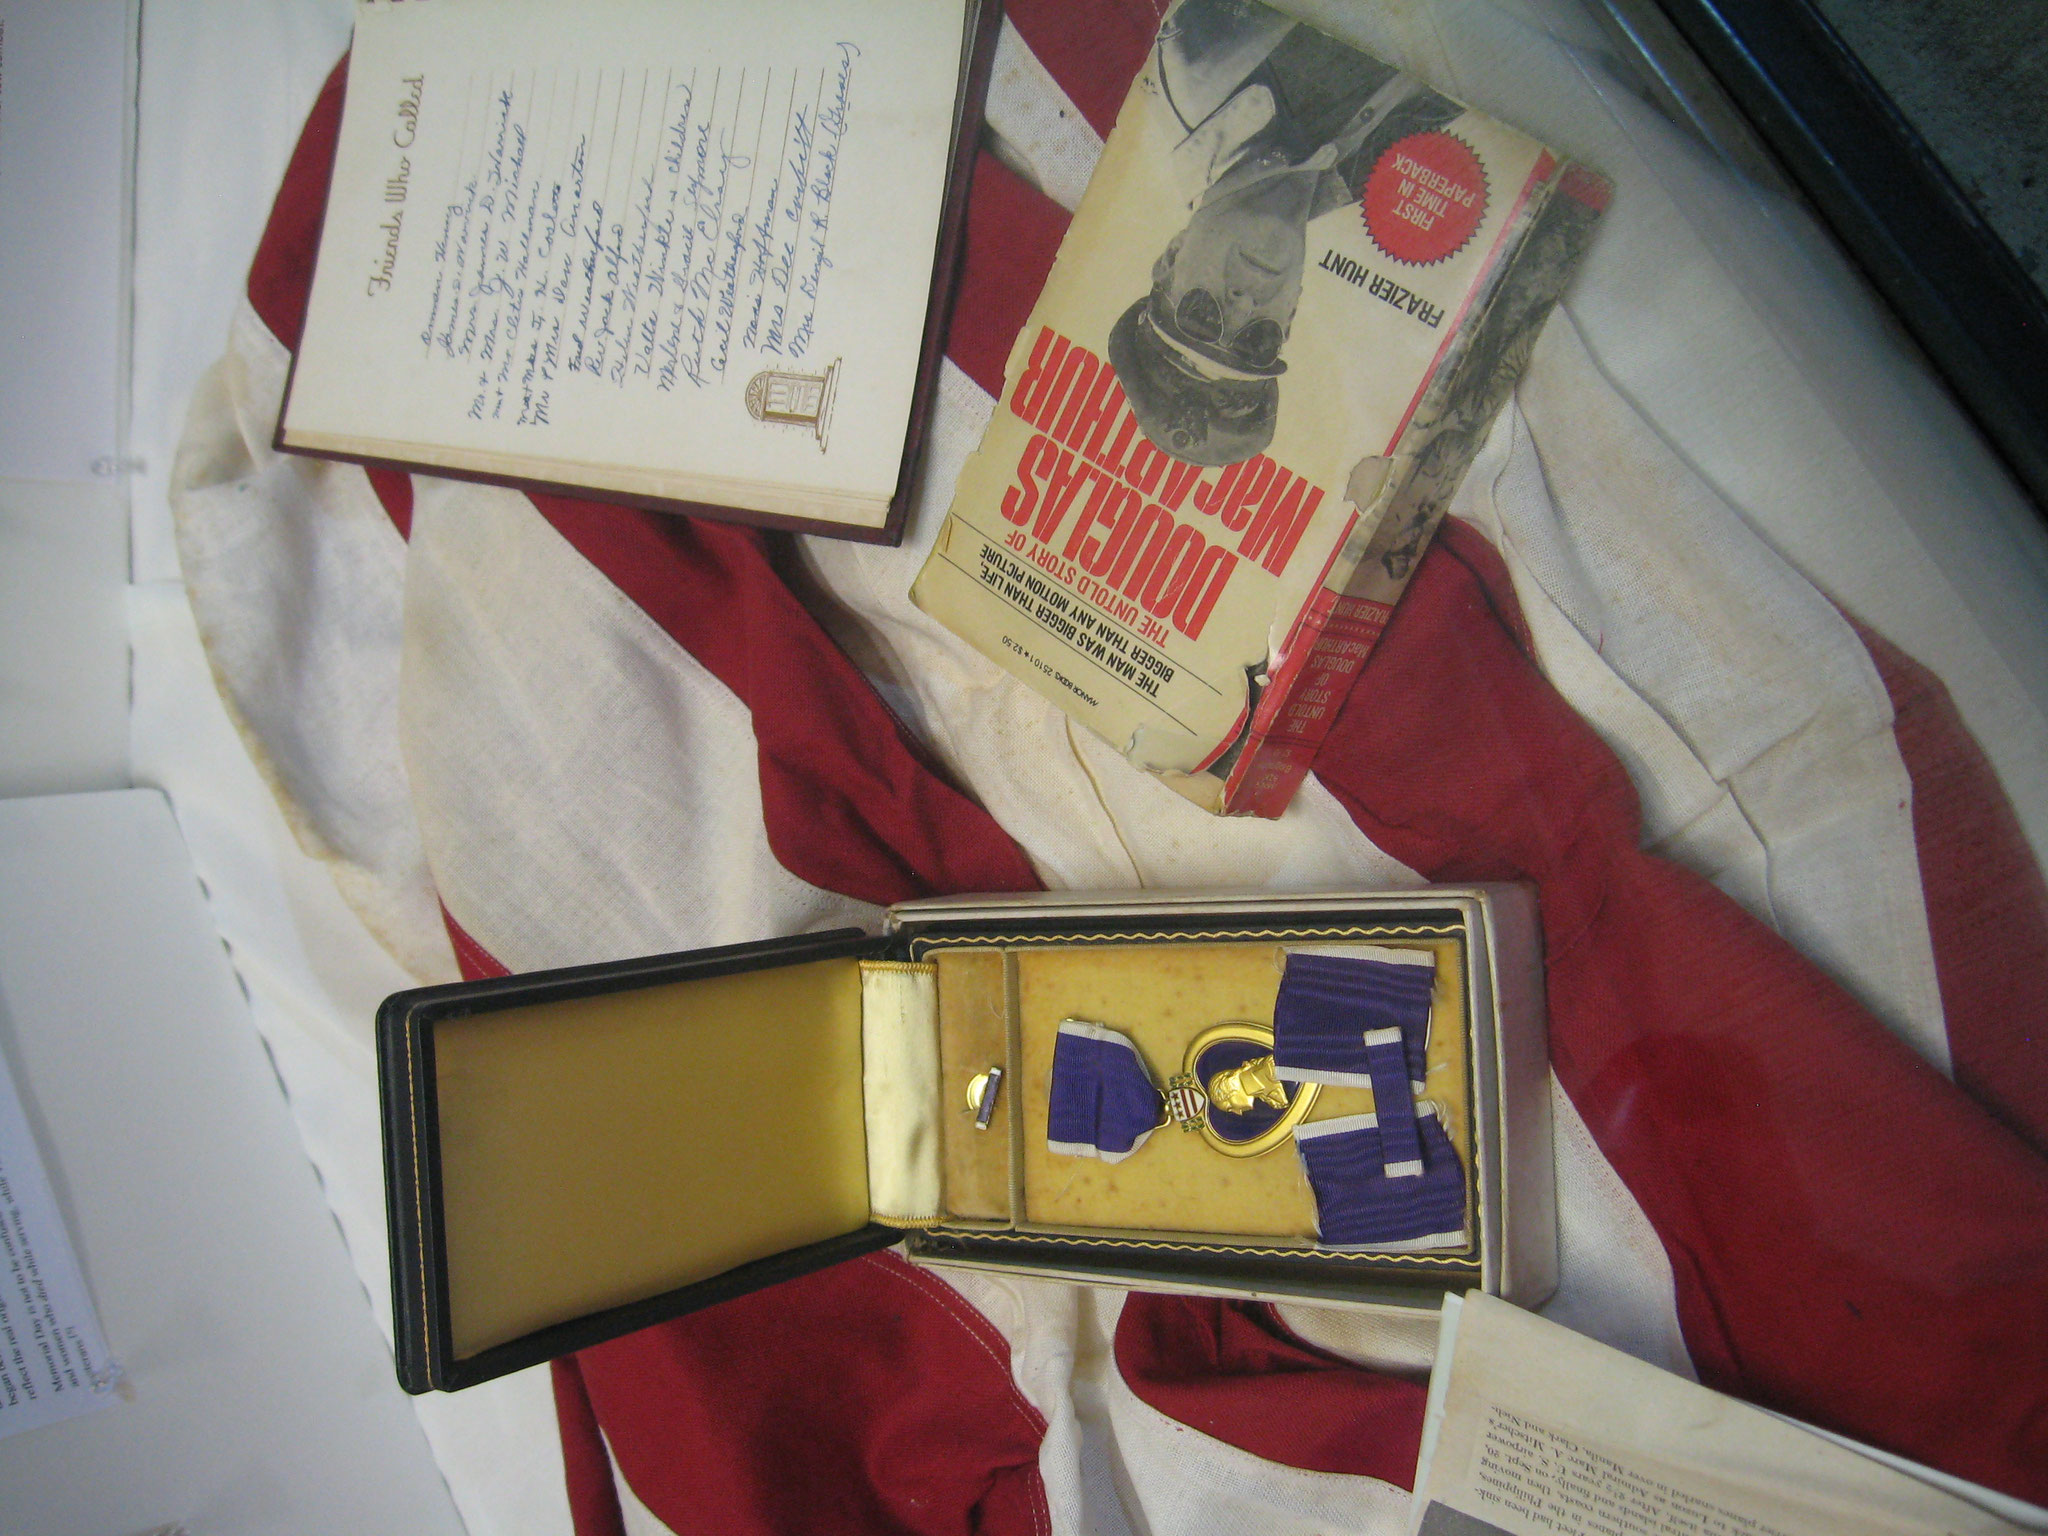 Hamrick memorabilia from WWII display, May 2016